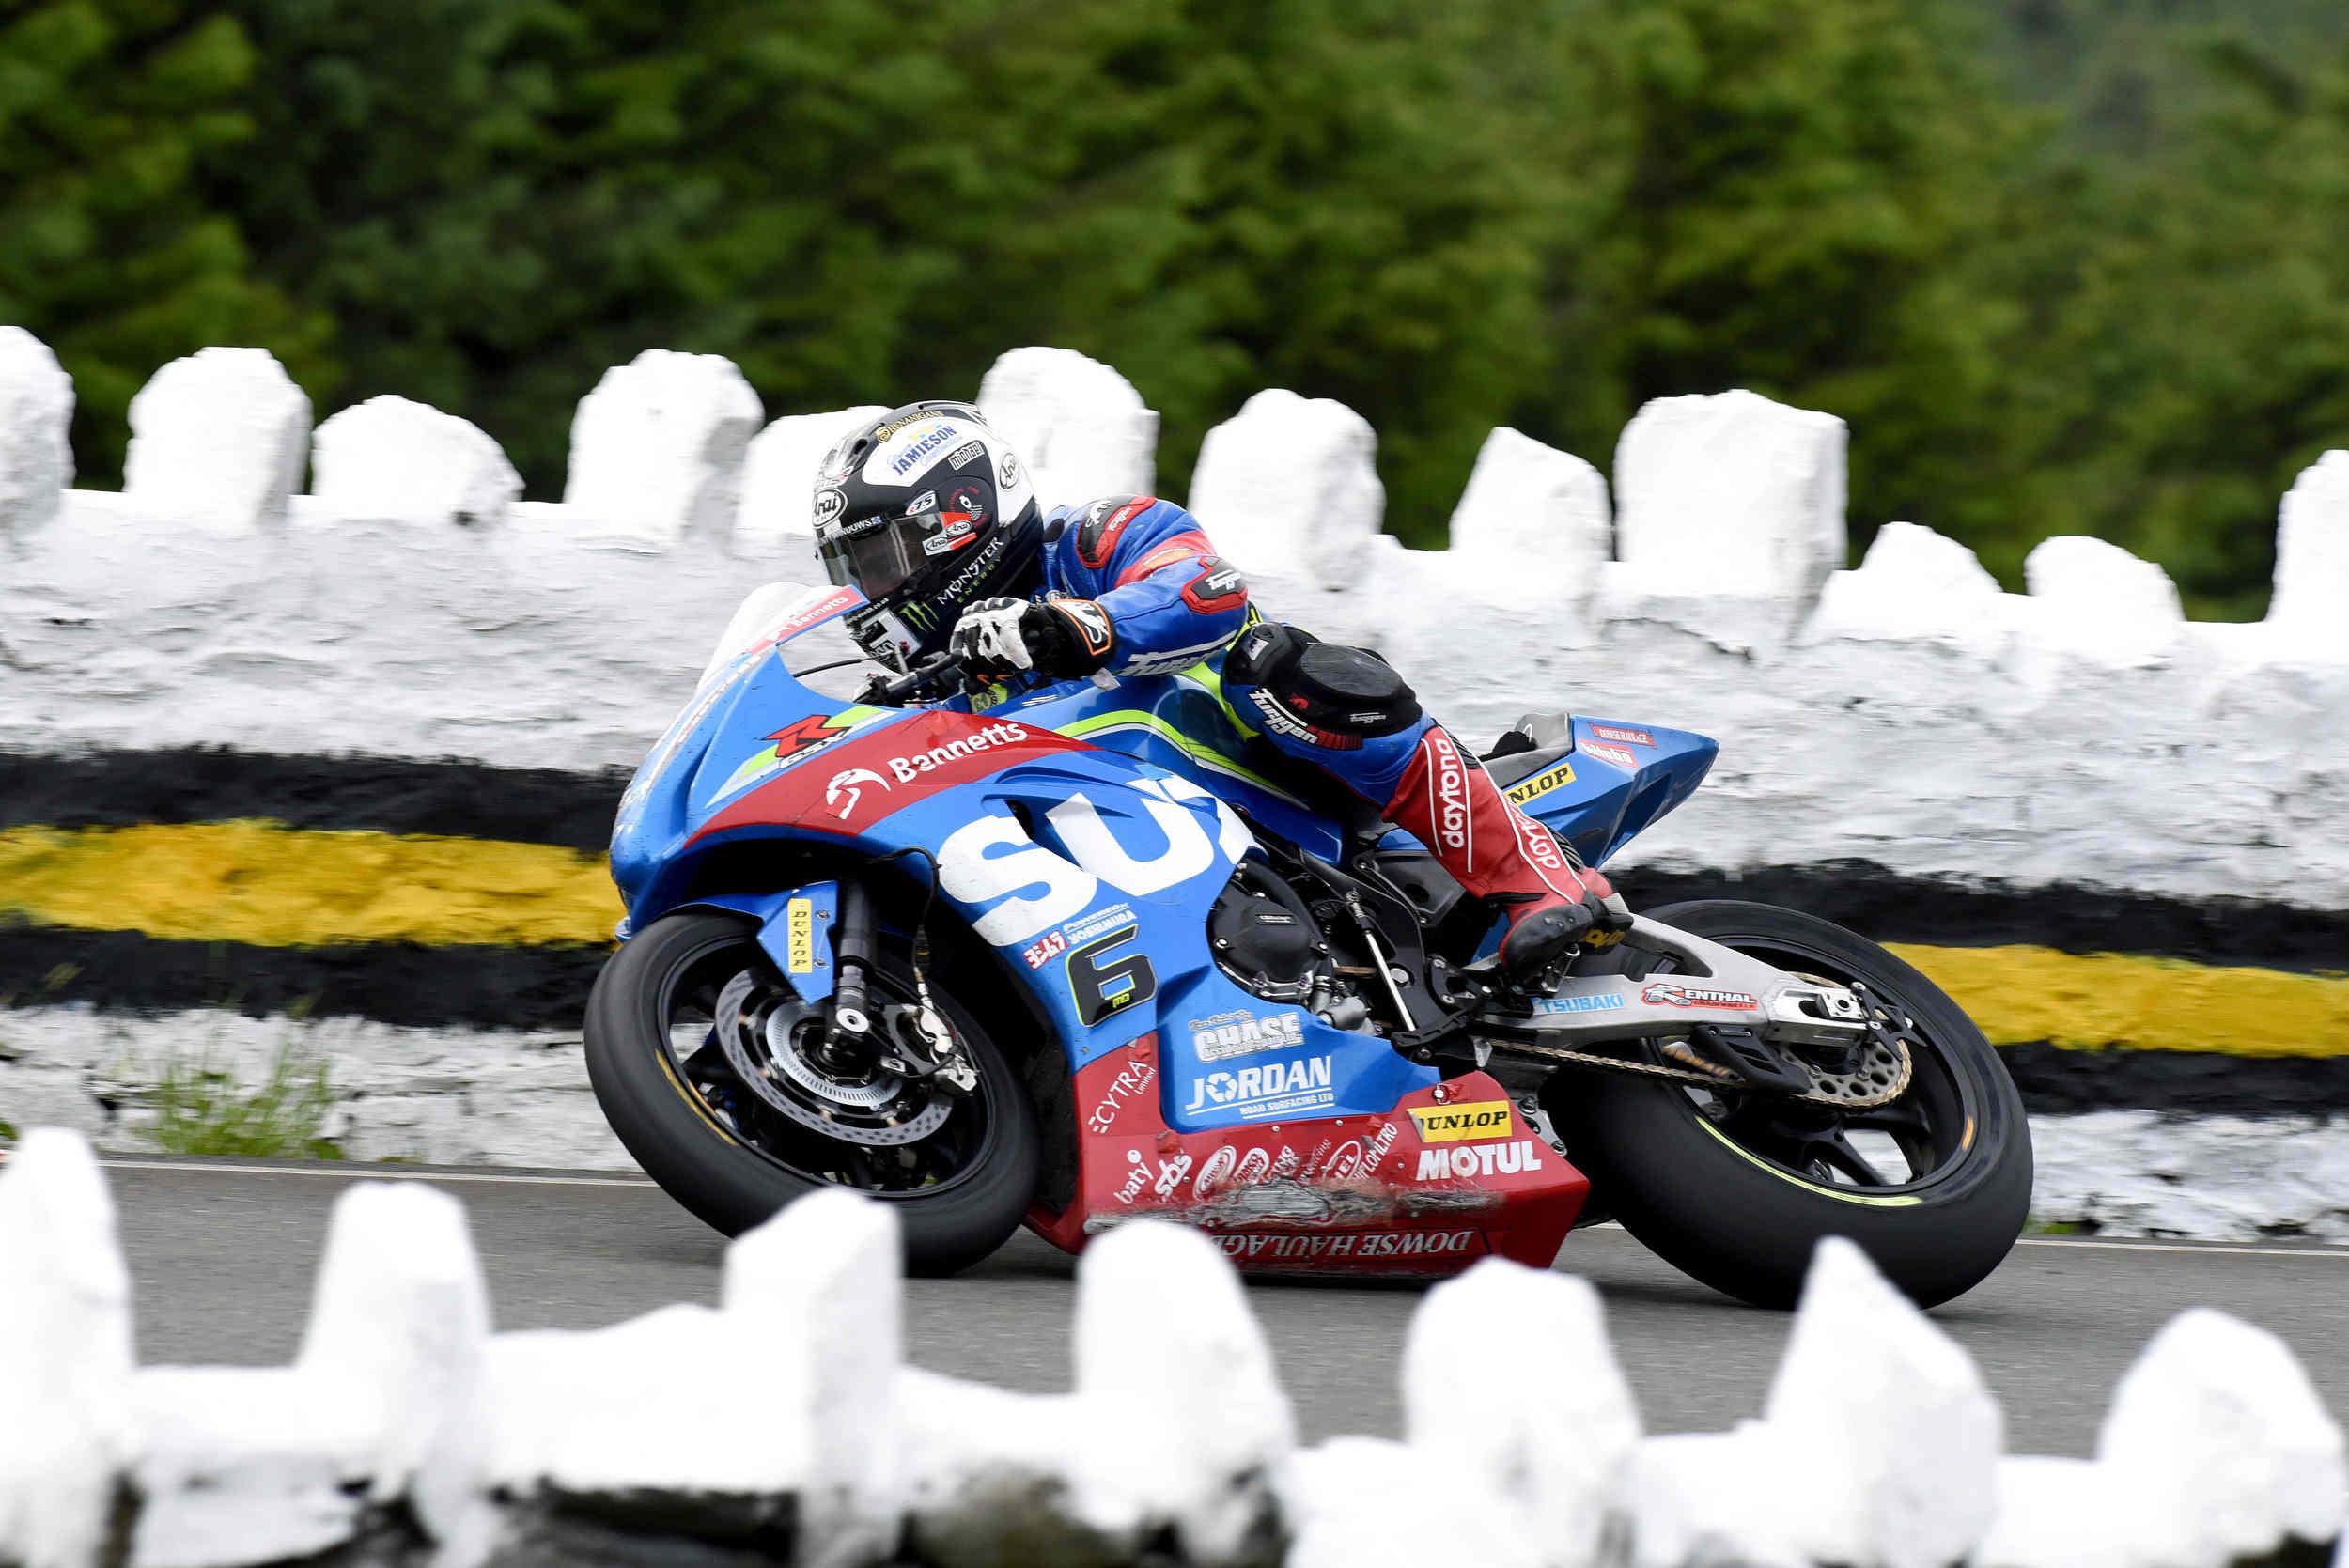 Senior TT 2017 - Michael Dunlop